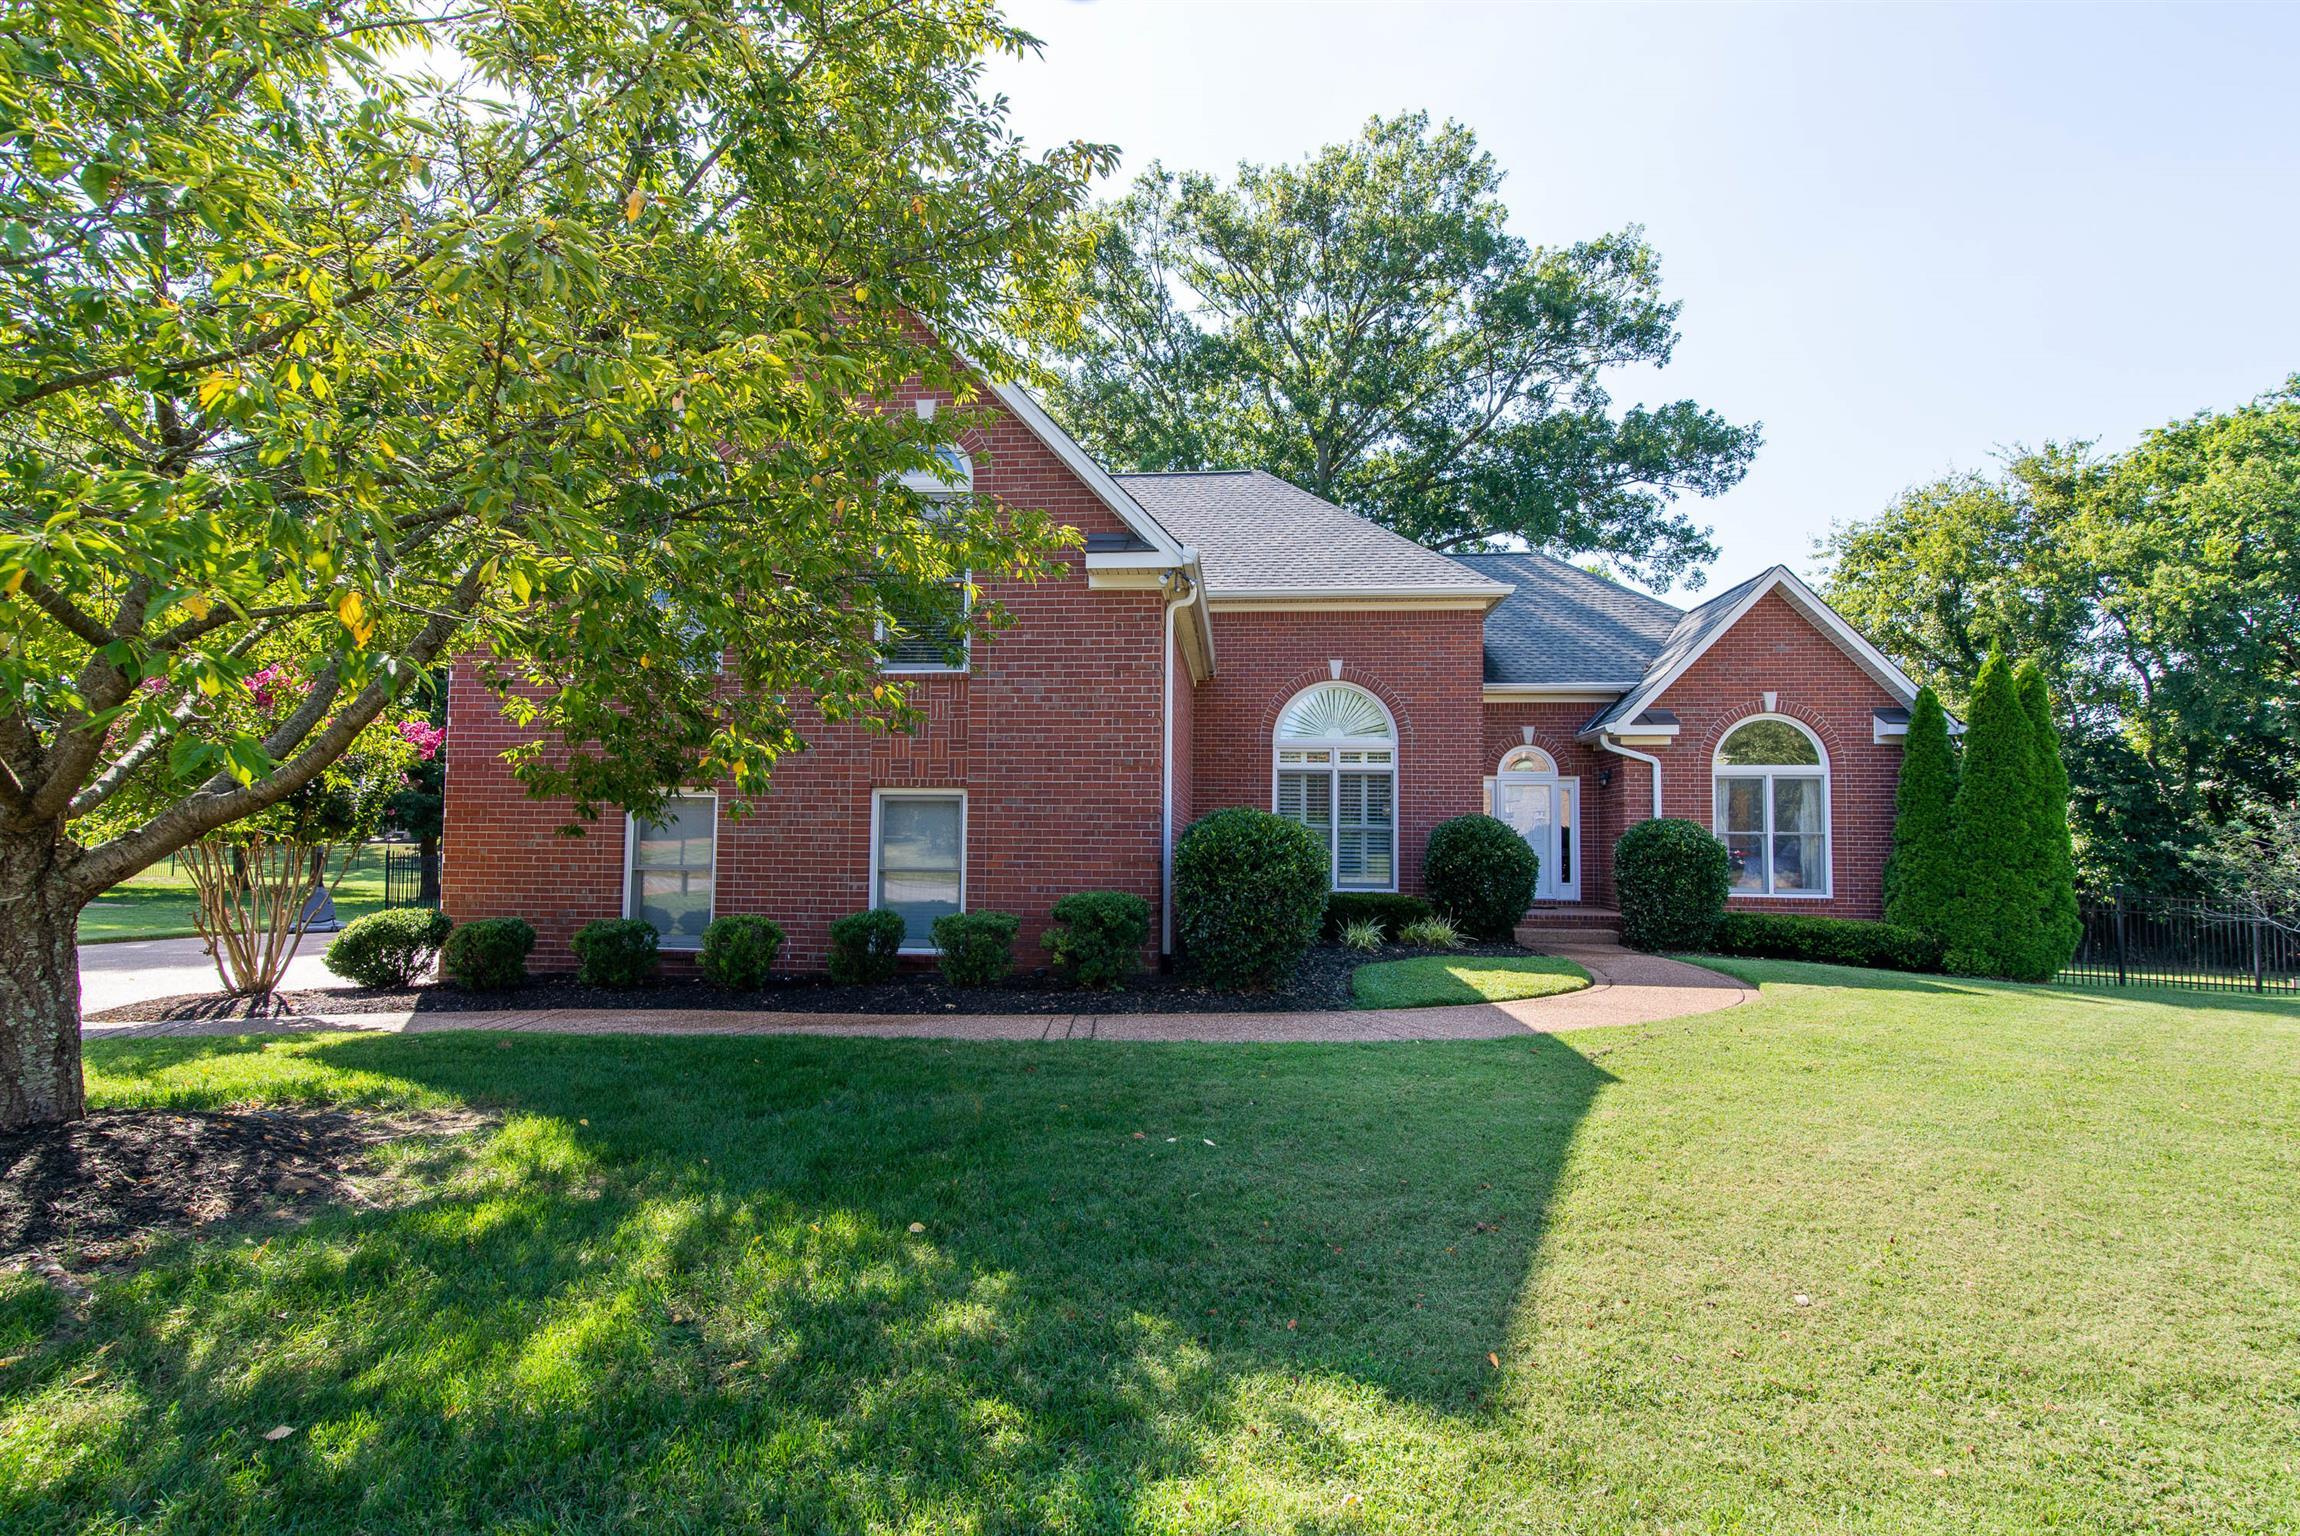 1837 Kaylee Meadow Ln, Hermitage, TN 37076 - Hermitage, TN real estate listing